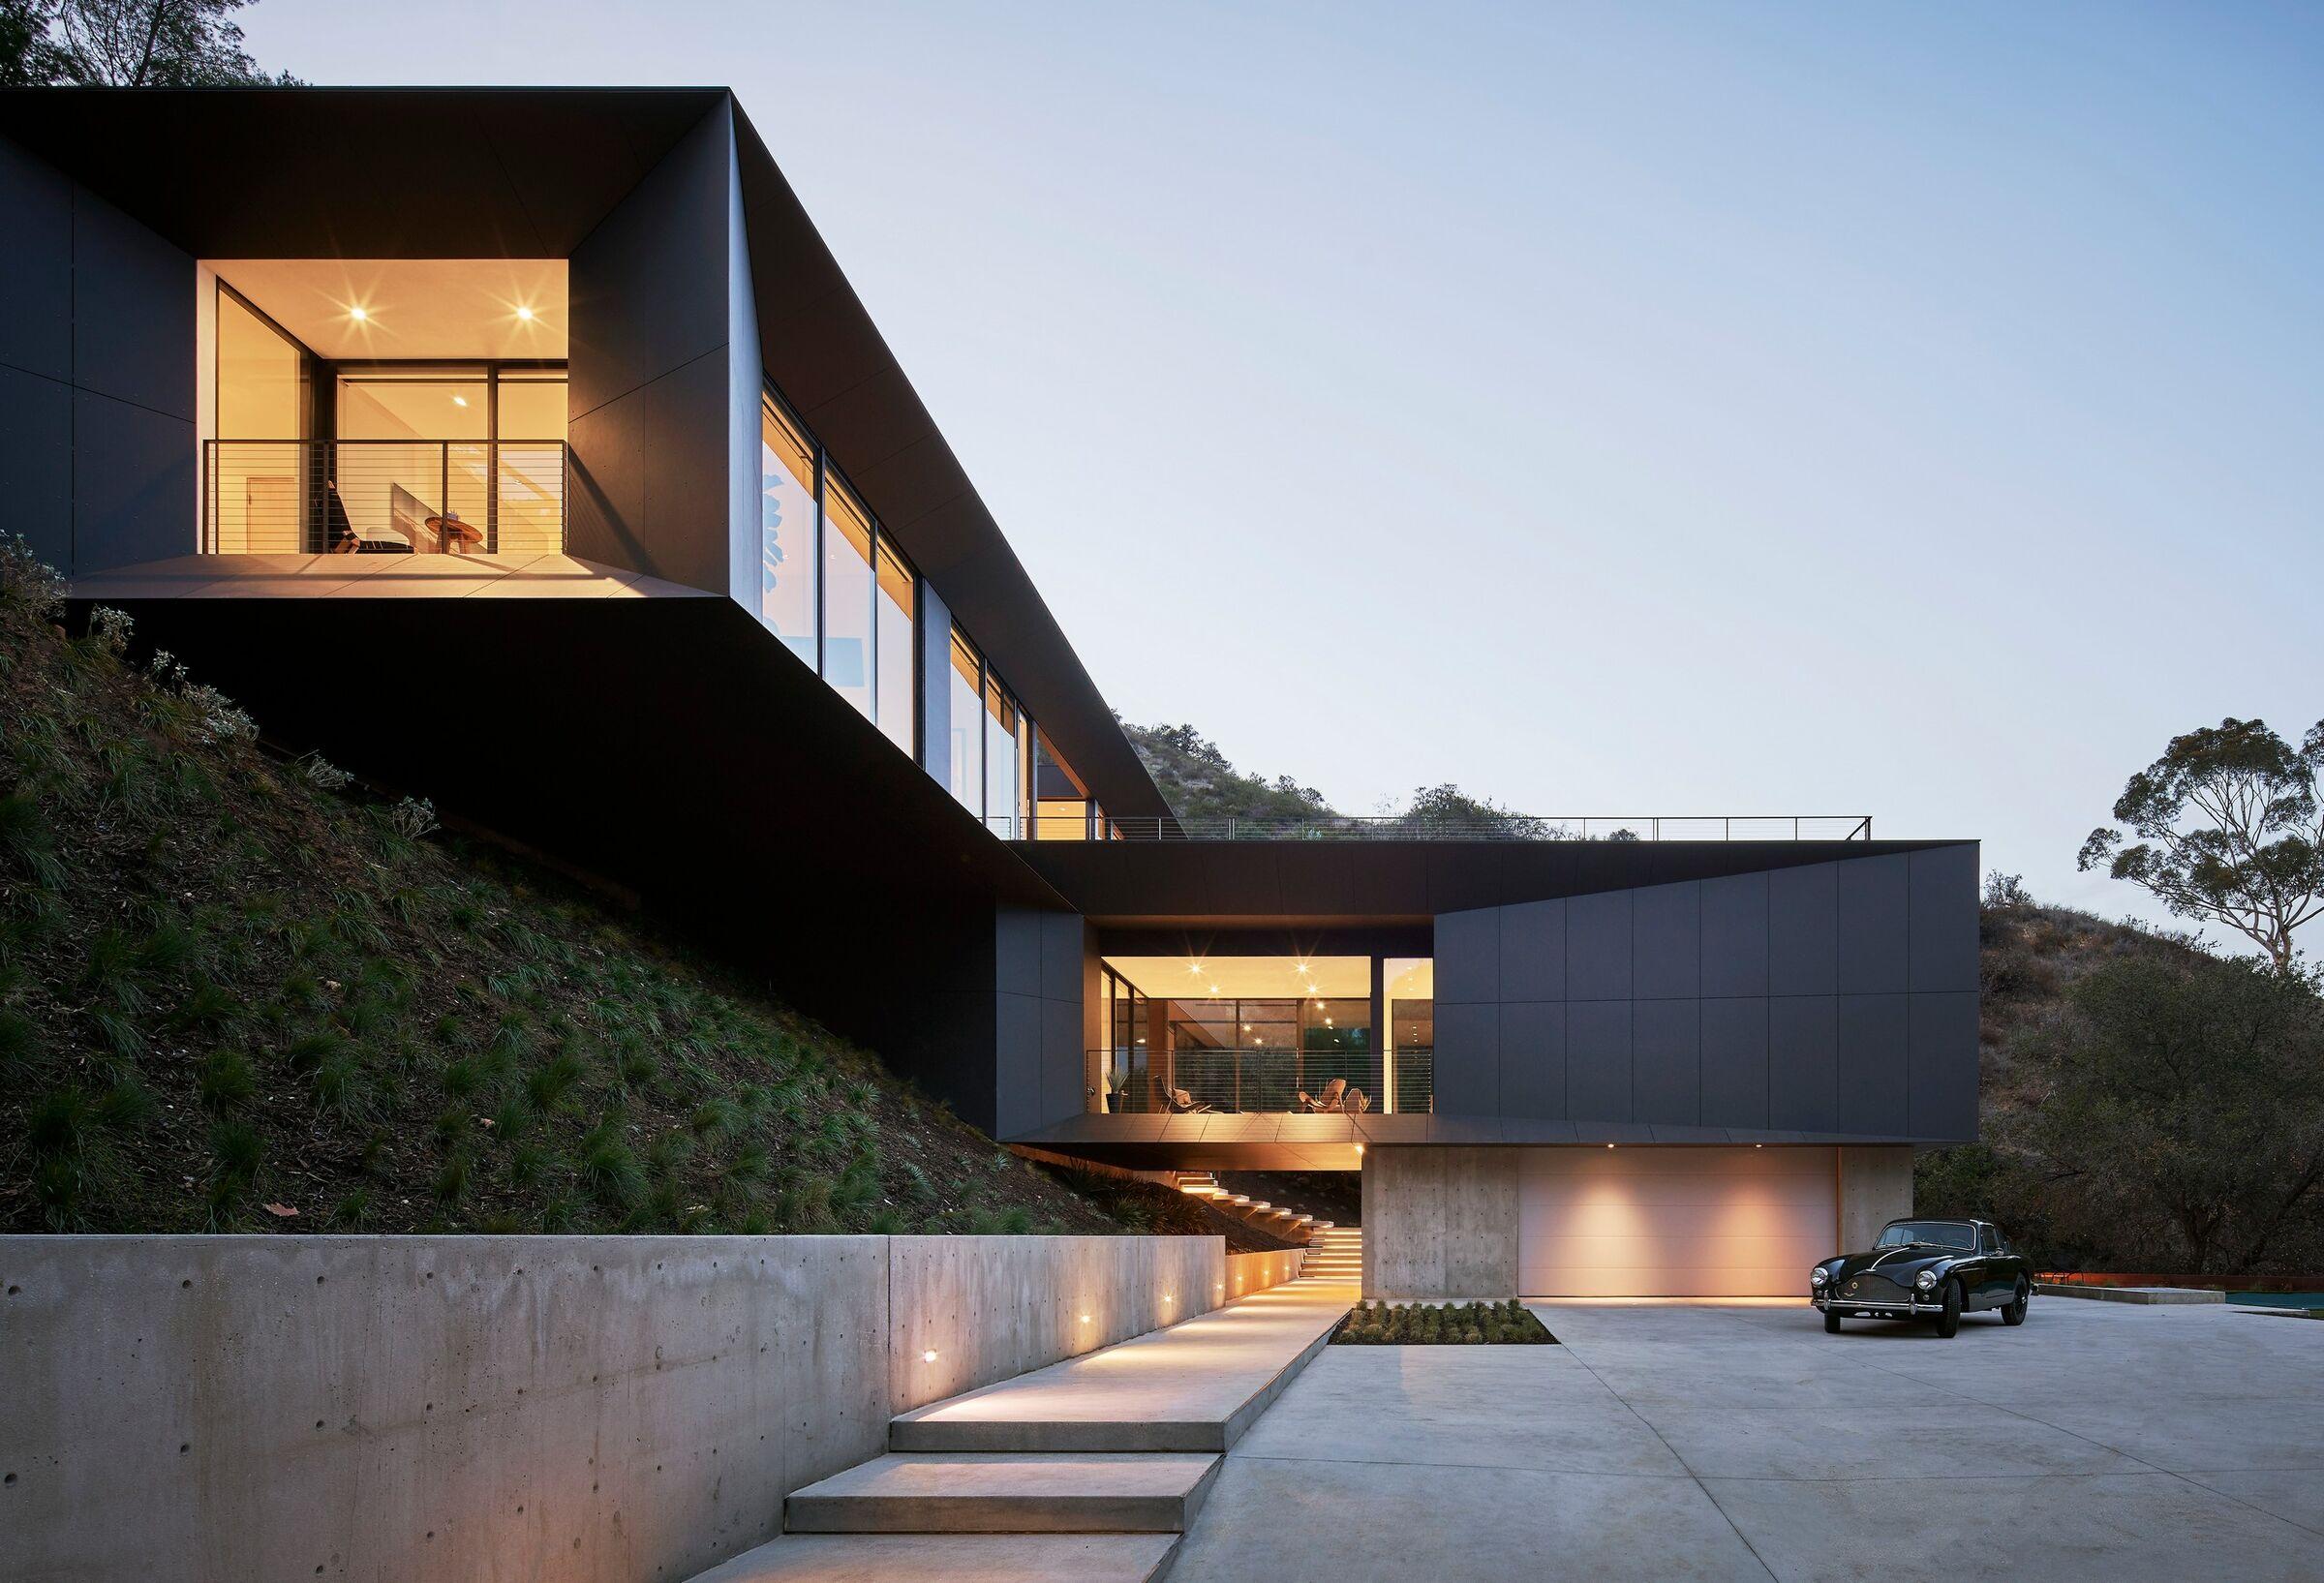 LR2 House in Pasadena, California by Montalba Architects